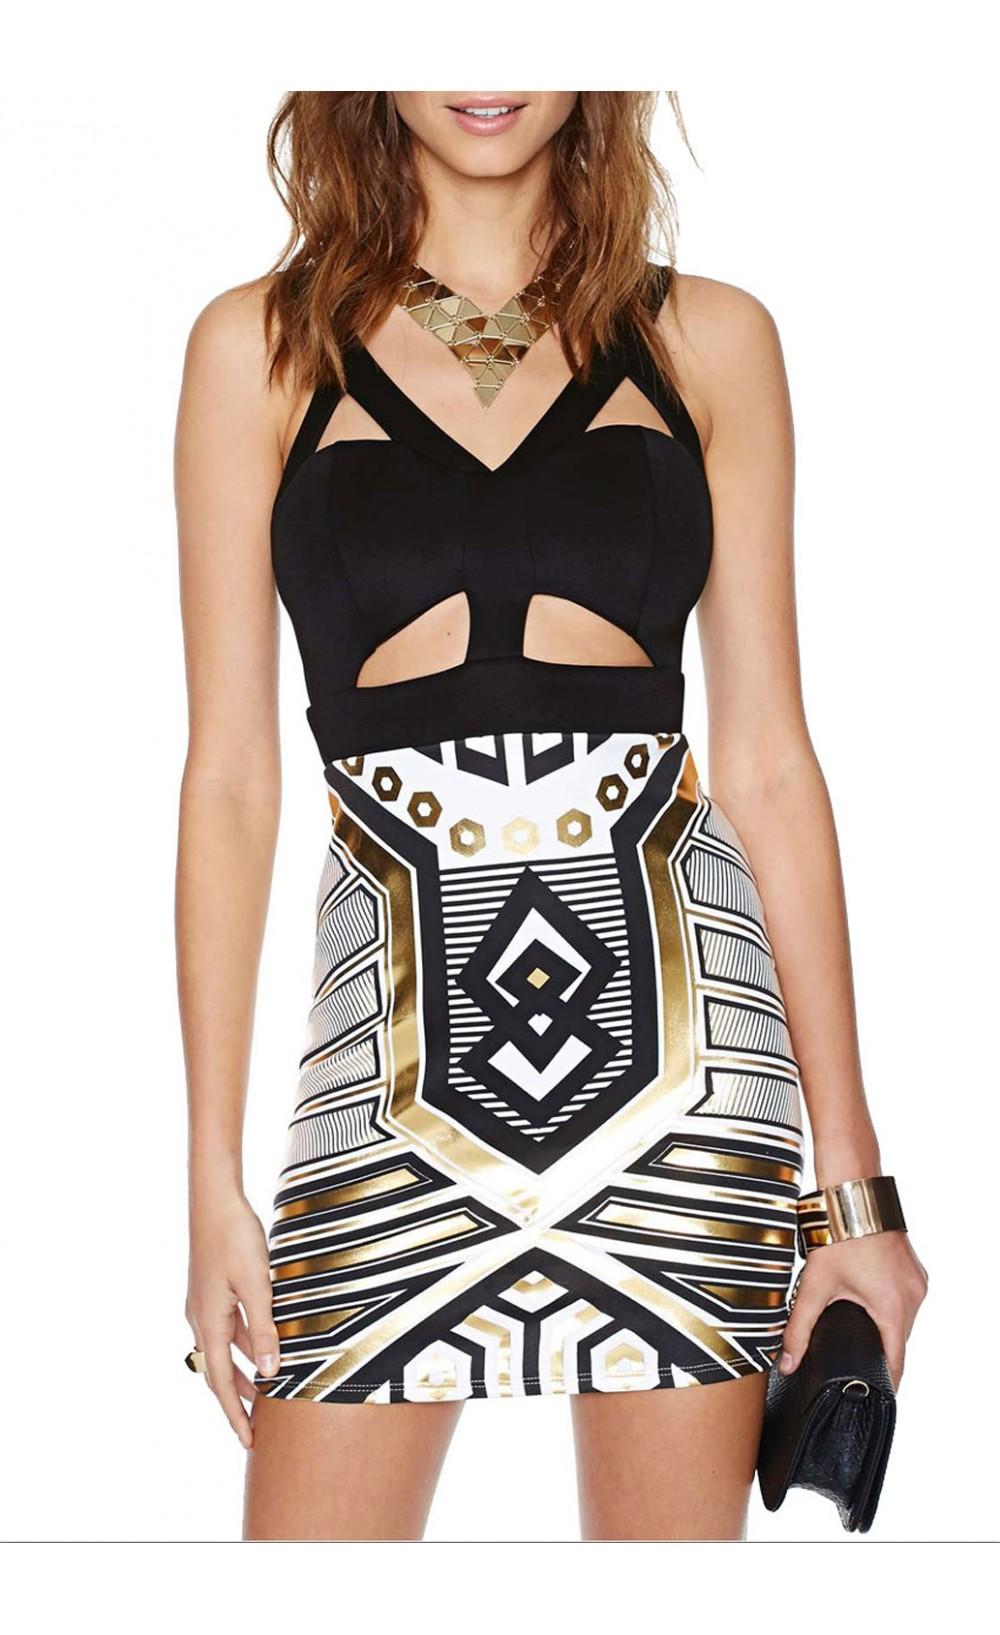 Stylish cutout bodycon dress with metallic print